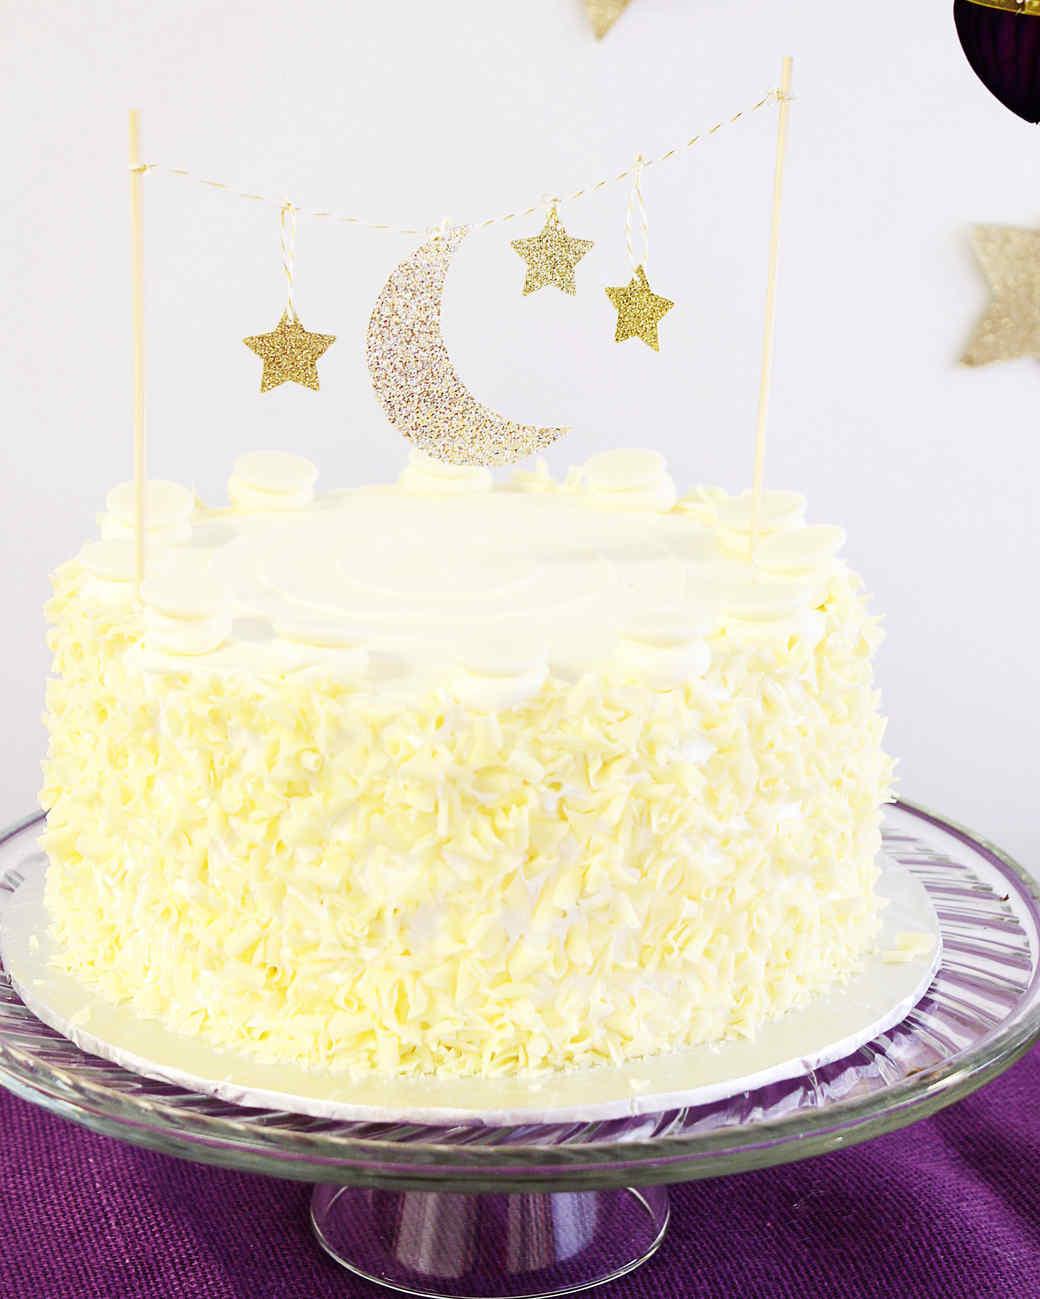 Fantastic Outdoor Eid Al-Fitr Decorations - eid-al-fitr-cake-topper-1-0617_vert  Snapshot_18902 .jpg?itok\u003dlE3og2sW